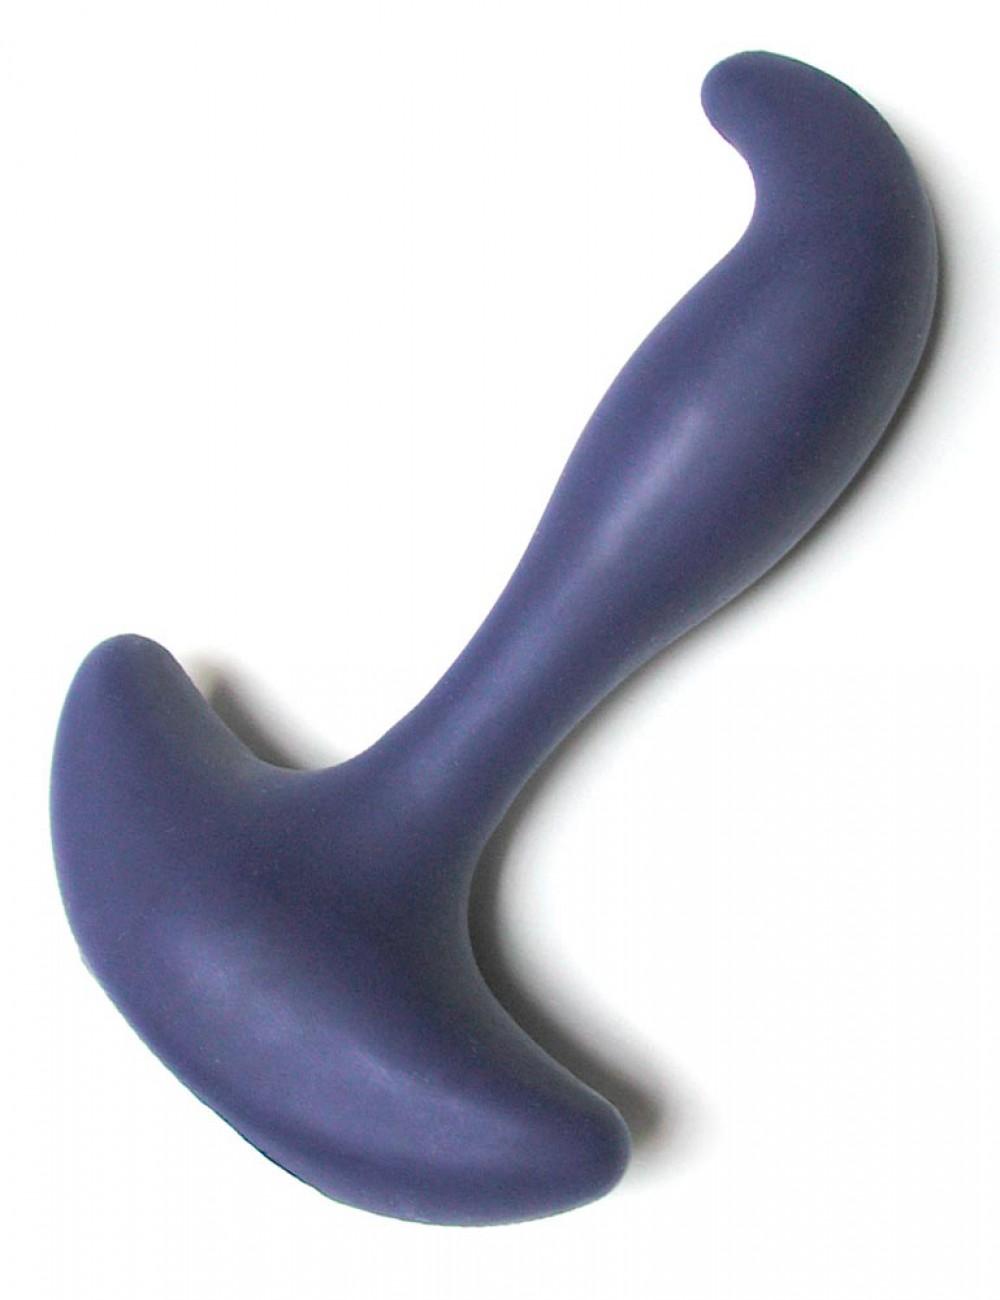 Pandora Vibrating Silicone Prostate Massager